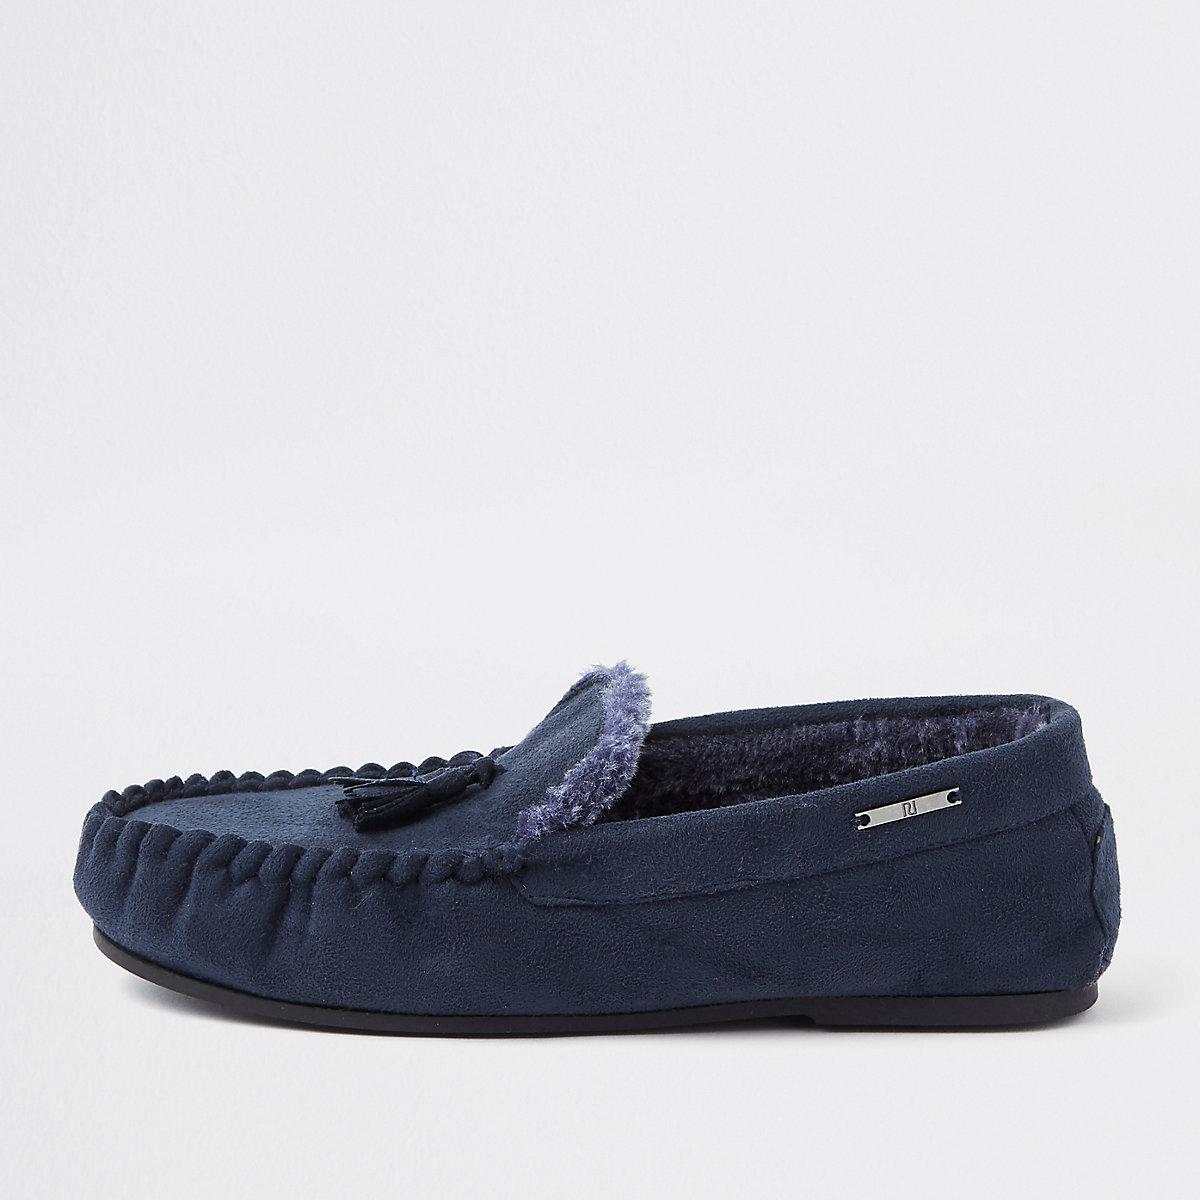 Navy tassle moccasin slippers